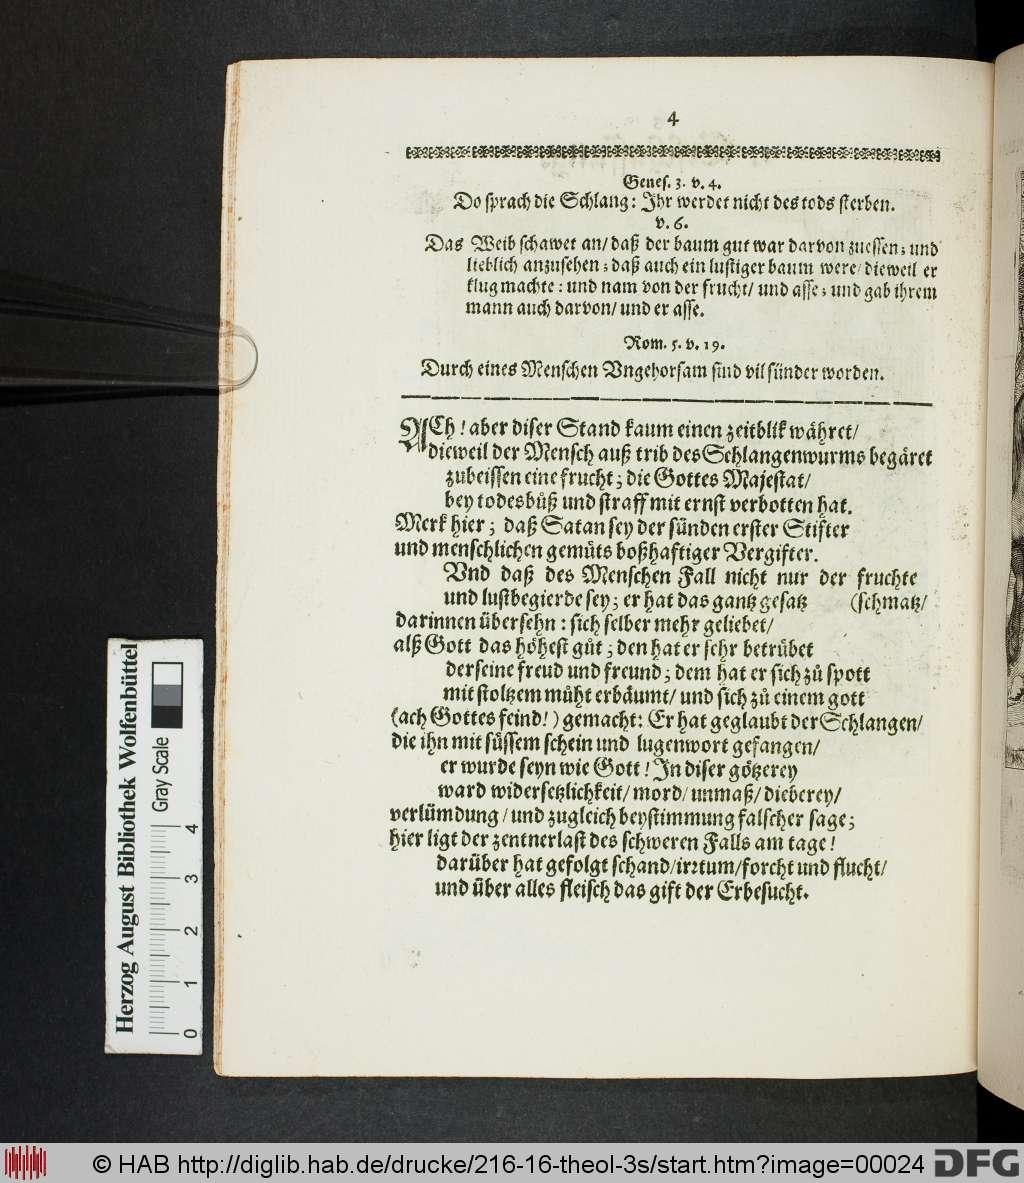 http://diglib.hab.de/drucke/216-16-theol-3s/00024.jpg